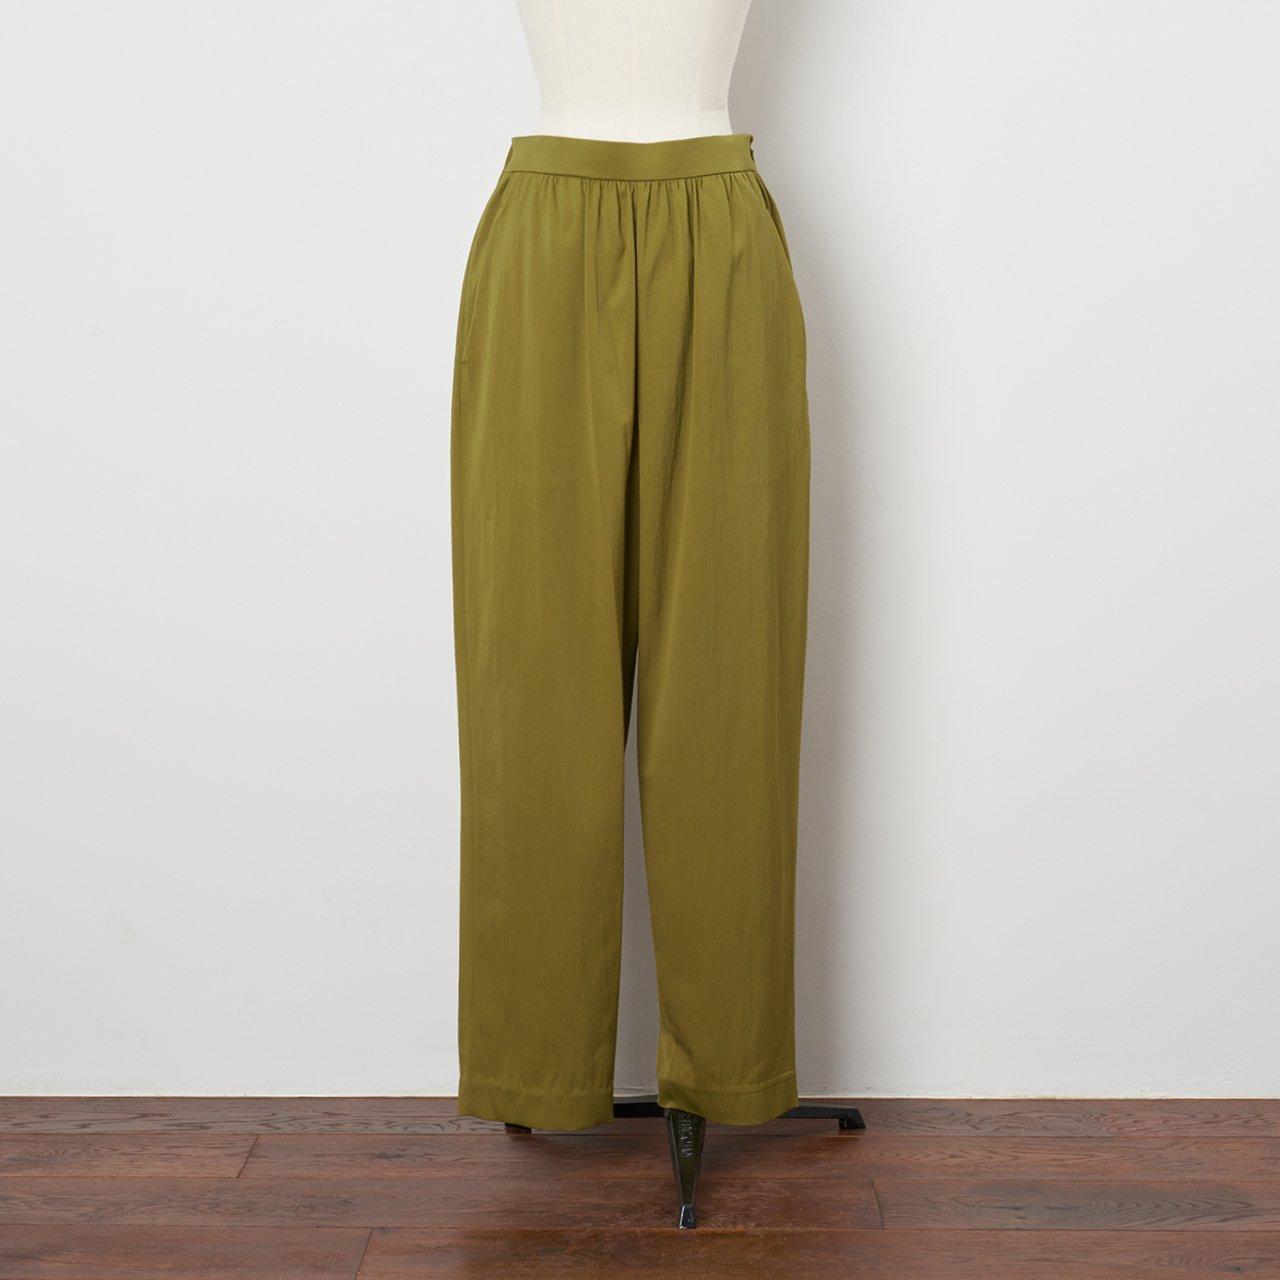 Pale Jute <BR>basic gather pants<BR>khaki